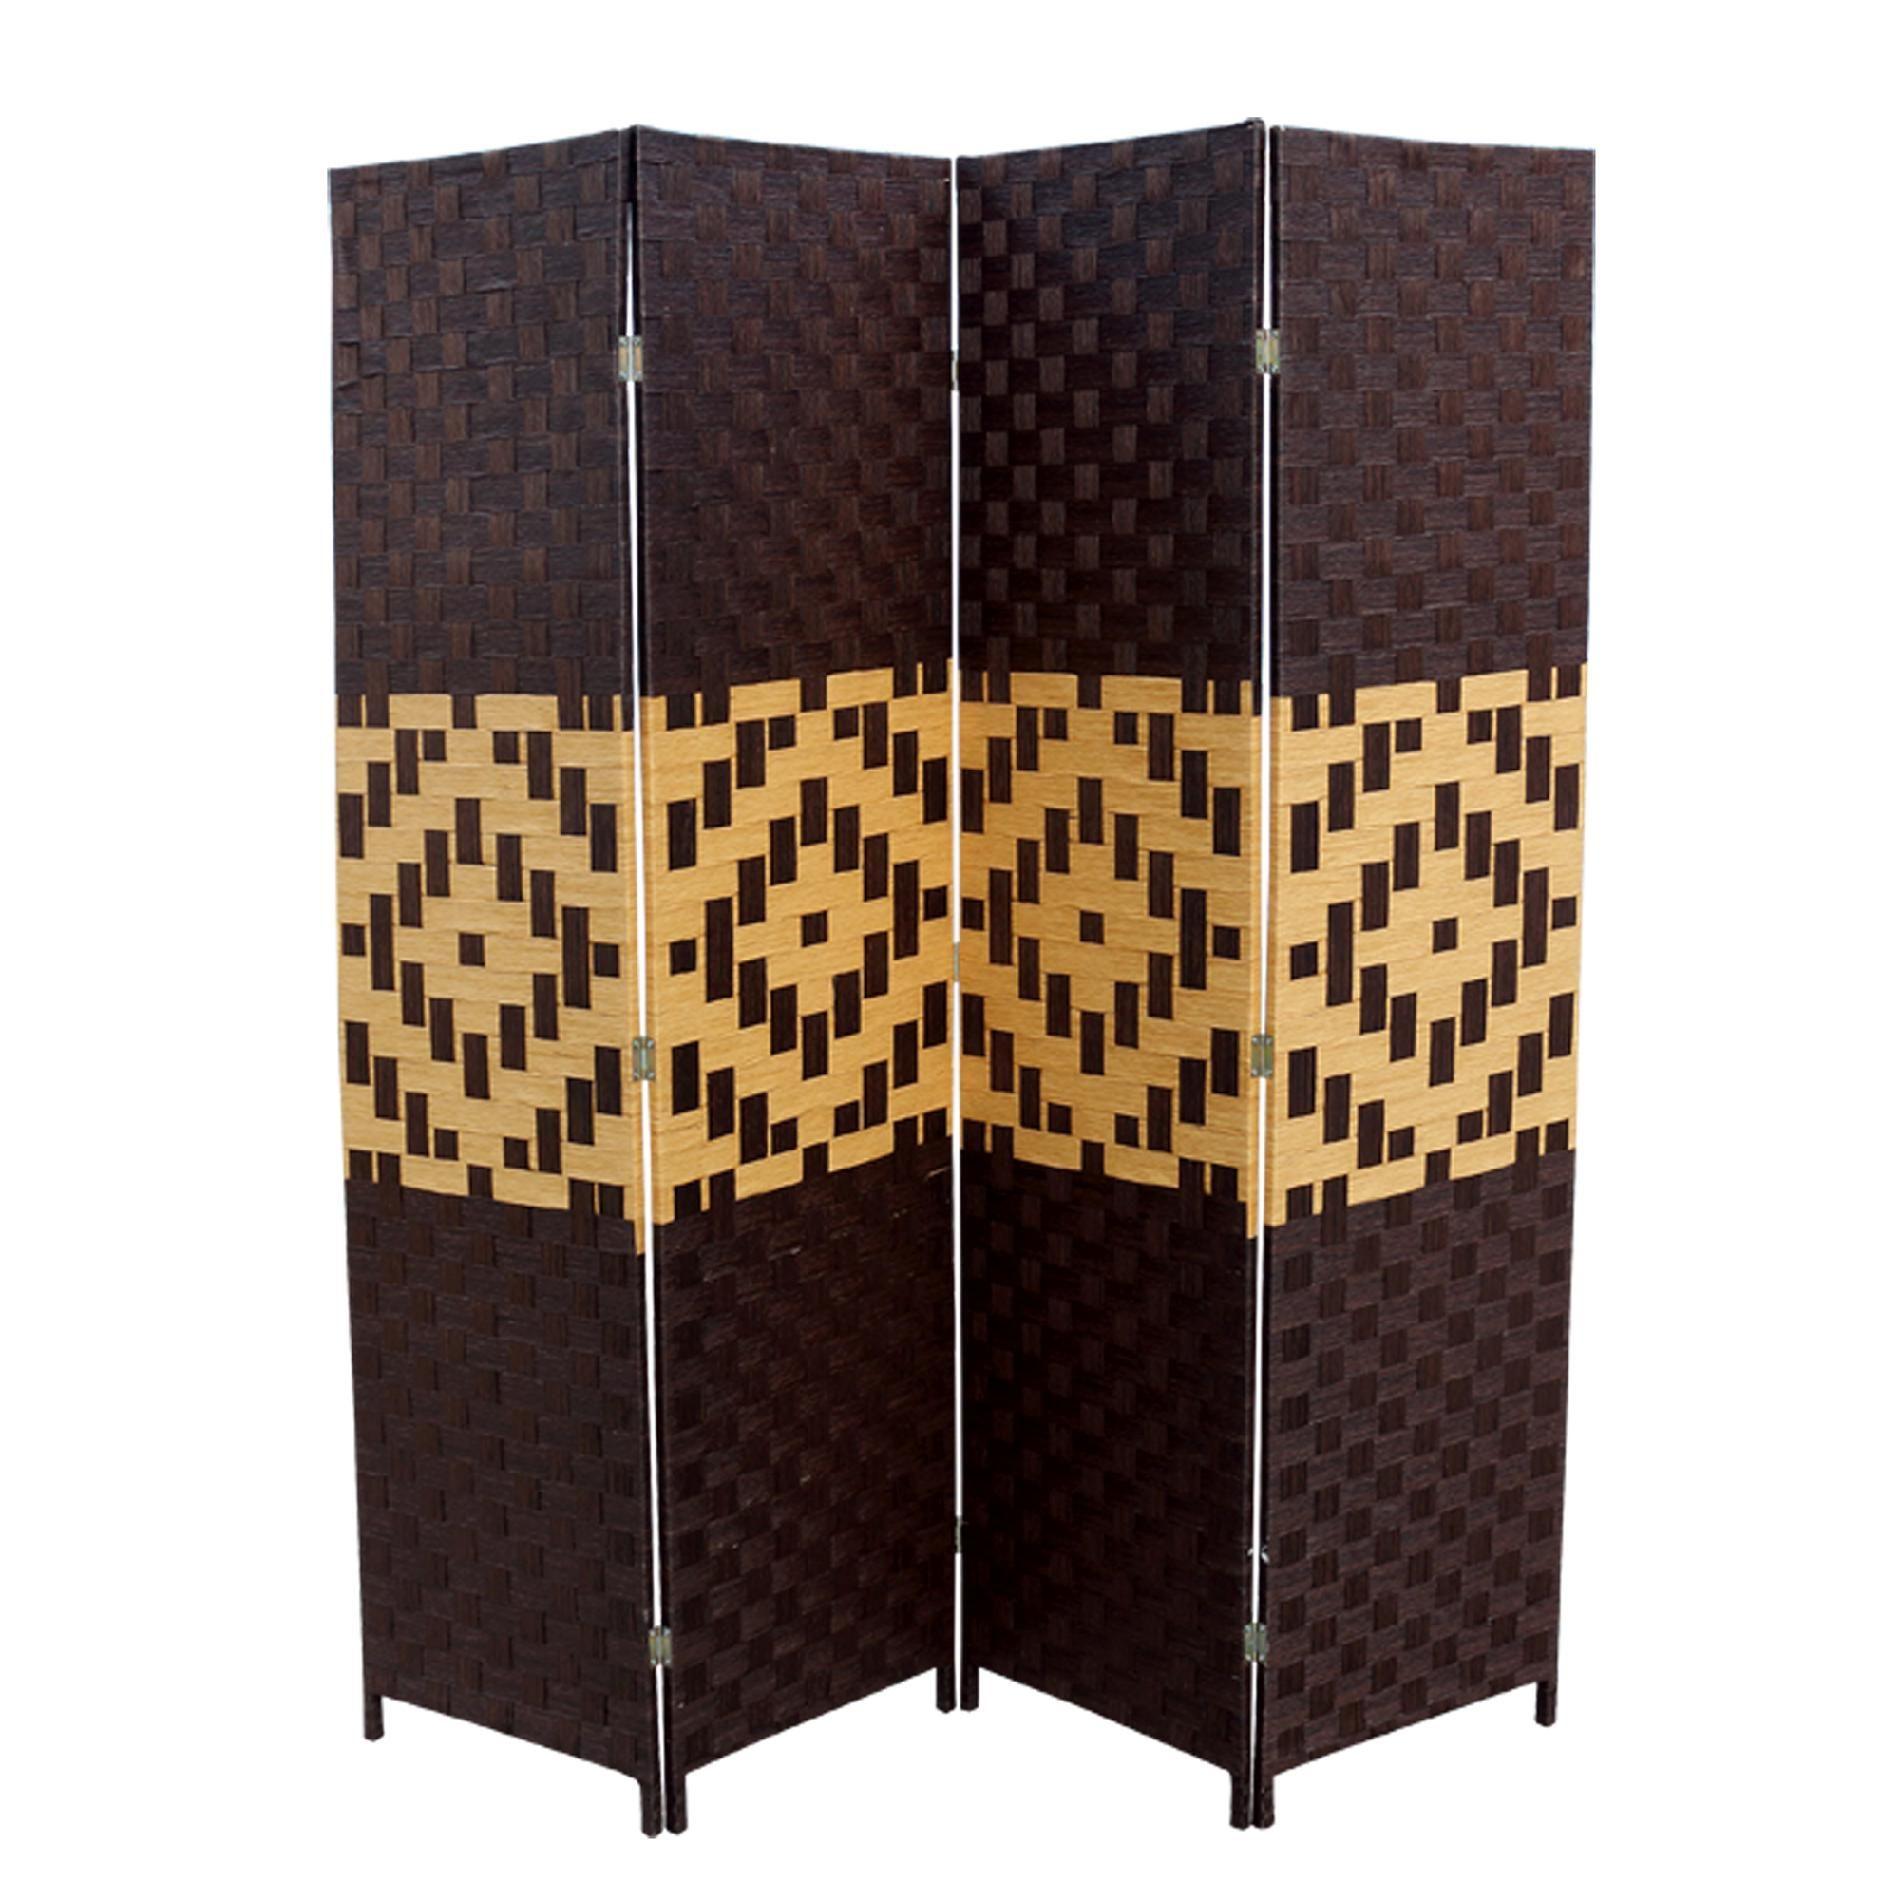 Ore International Espresso And Brown Paper Straw Weave Screen, Multi